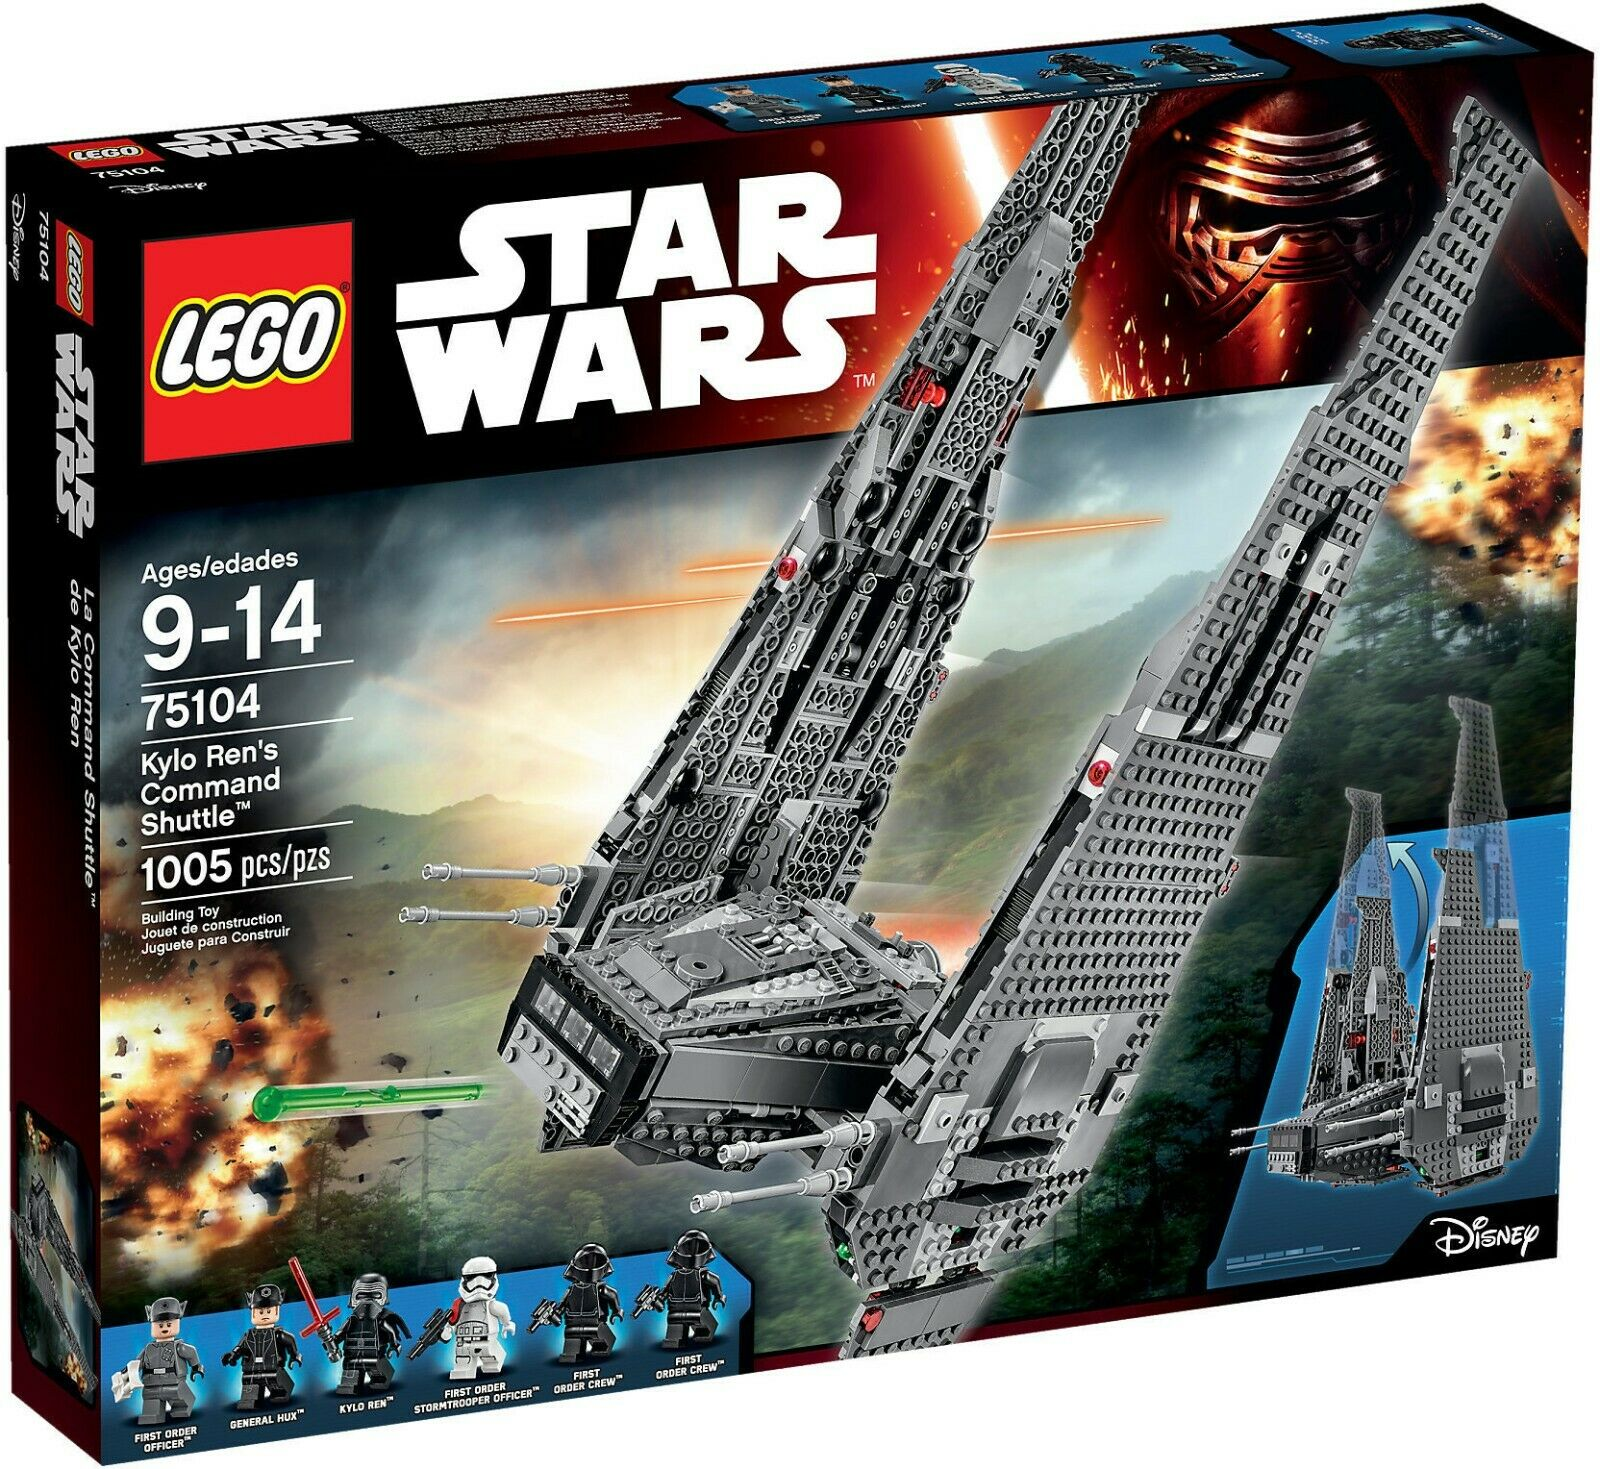 LEGO 75104 estrella guerras  Kylo Ren's Comuomod Shuttle  Nuovo Sigillato